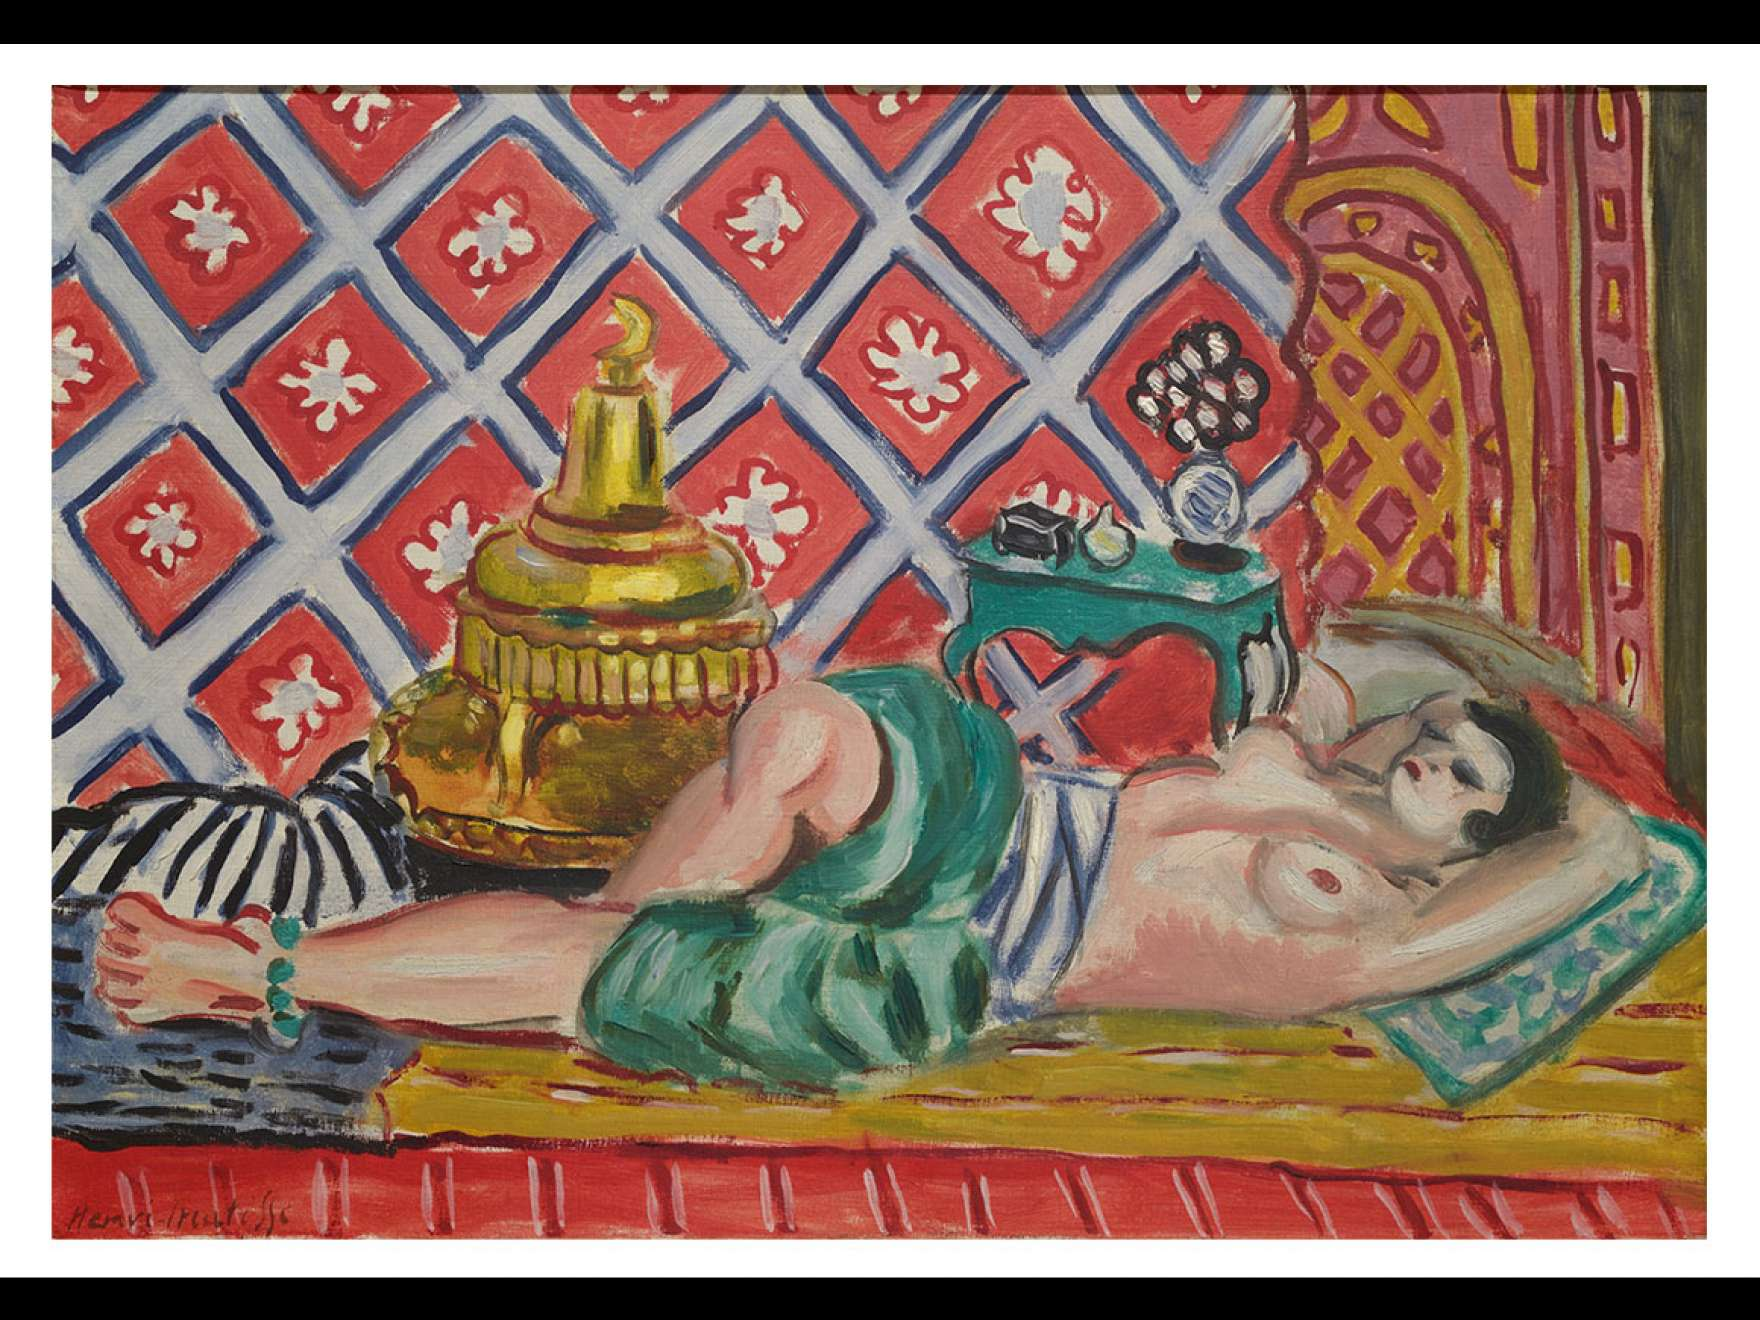 Henri Matisse's painting, Reclining Odalisque